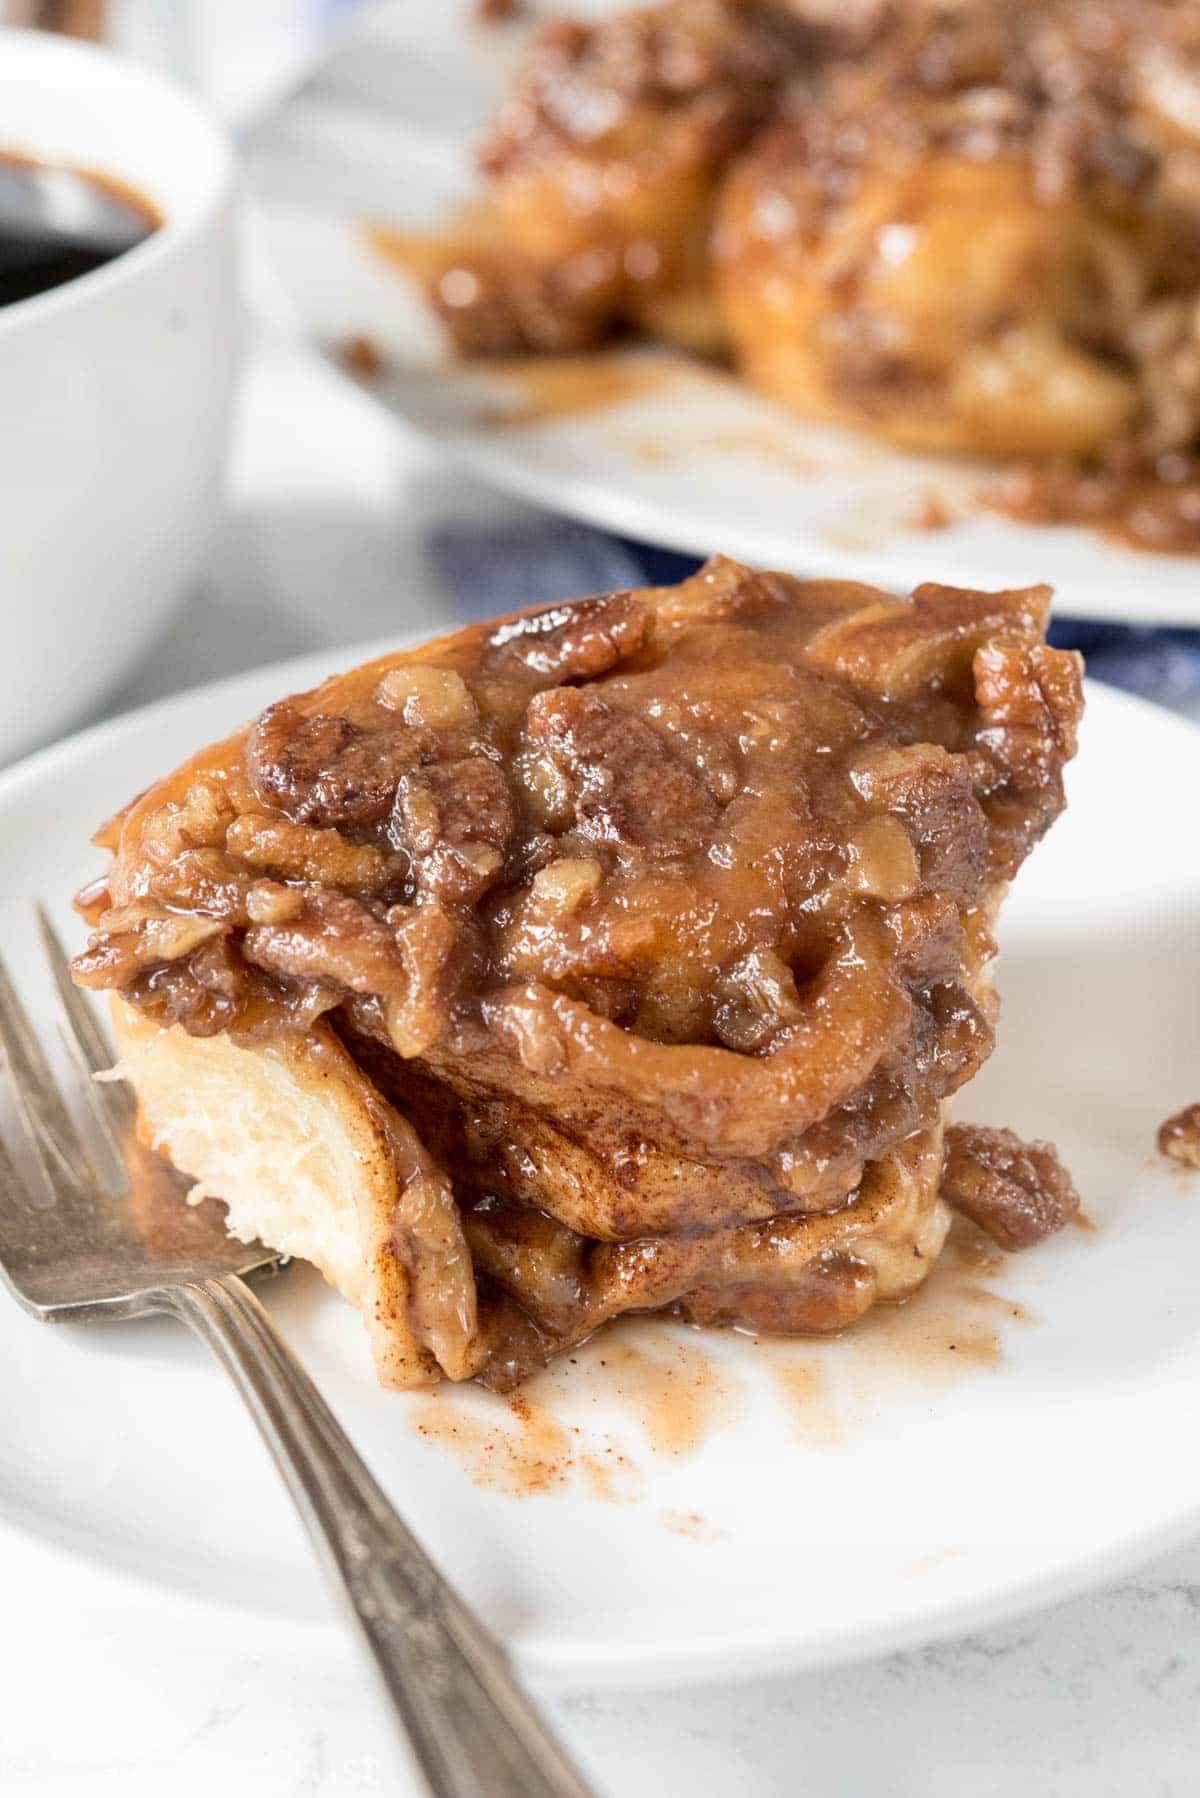 Easy Caramel Pecan Rolls recipe - like sticky buns but easier!